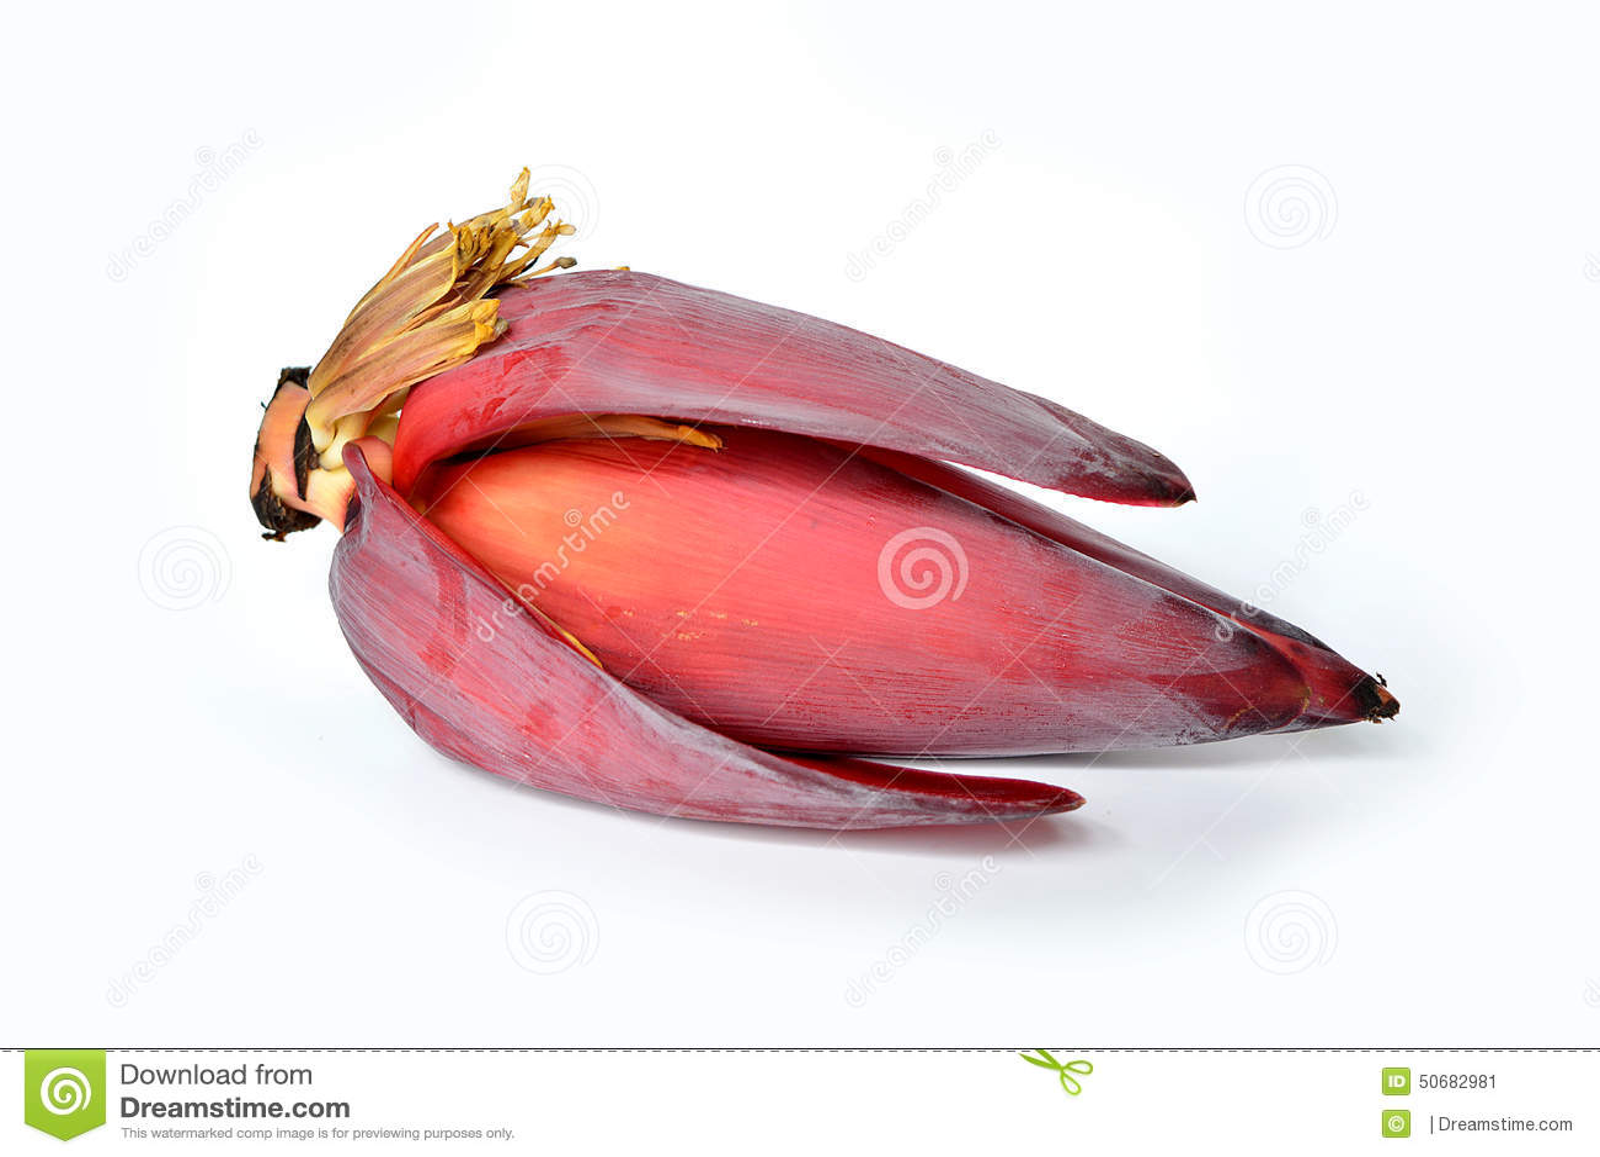 Download 香蕉开花 库存图片. 图片 包括有 沙拉, 楼梯栏杆, 查出, 果子, 可口, 背包, 食物, 密林, 详细资料 - 50682981